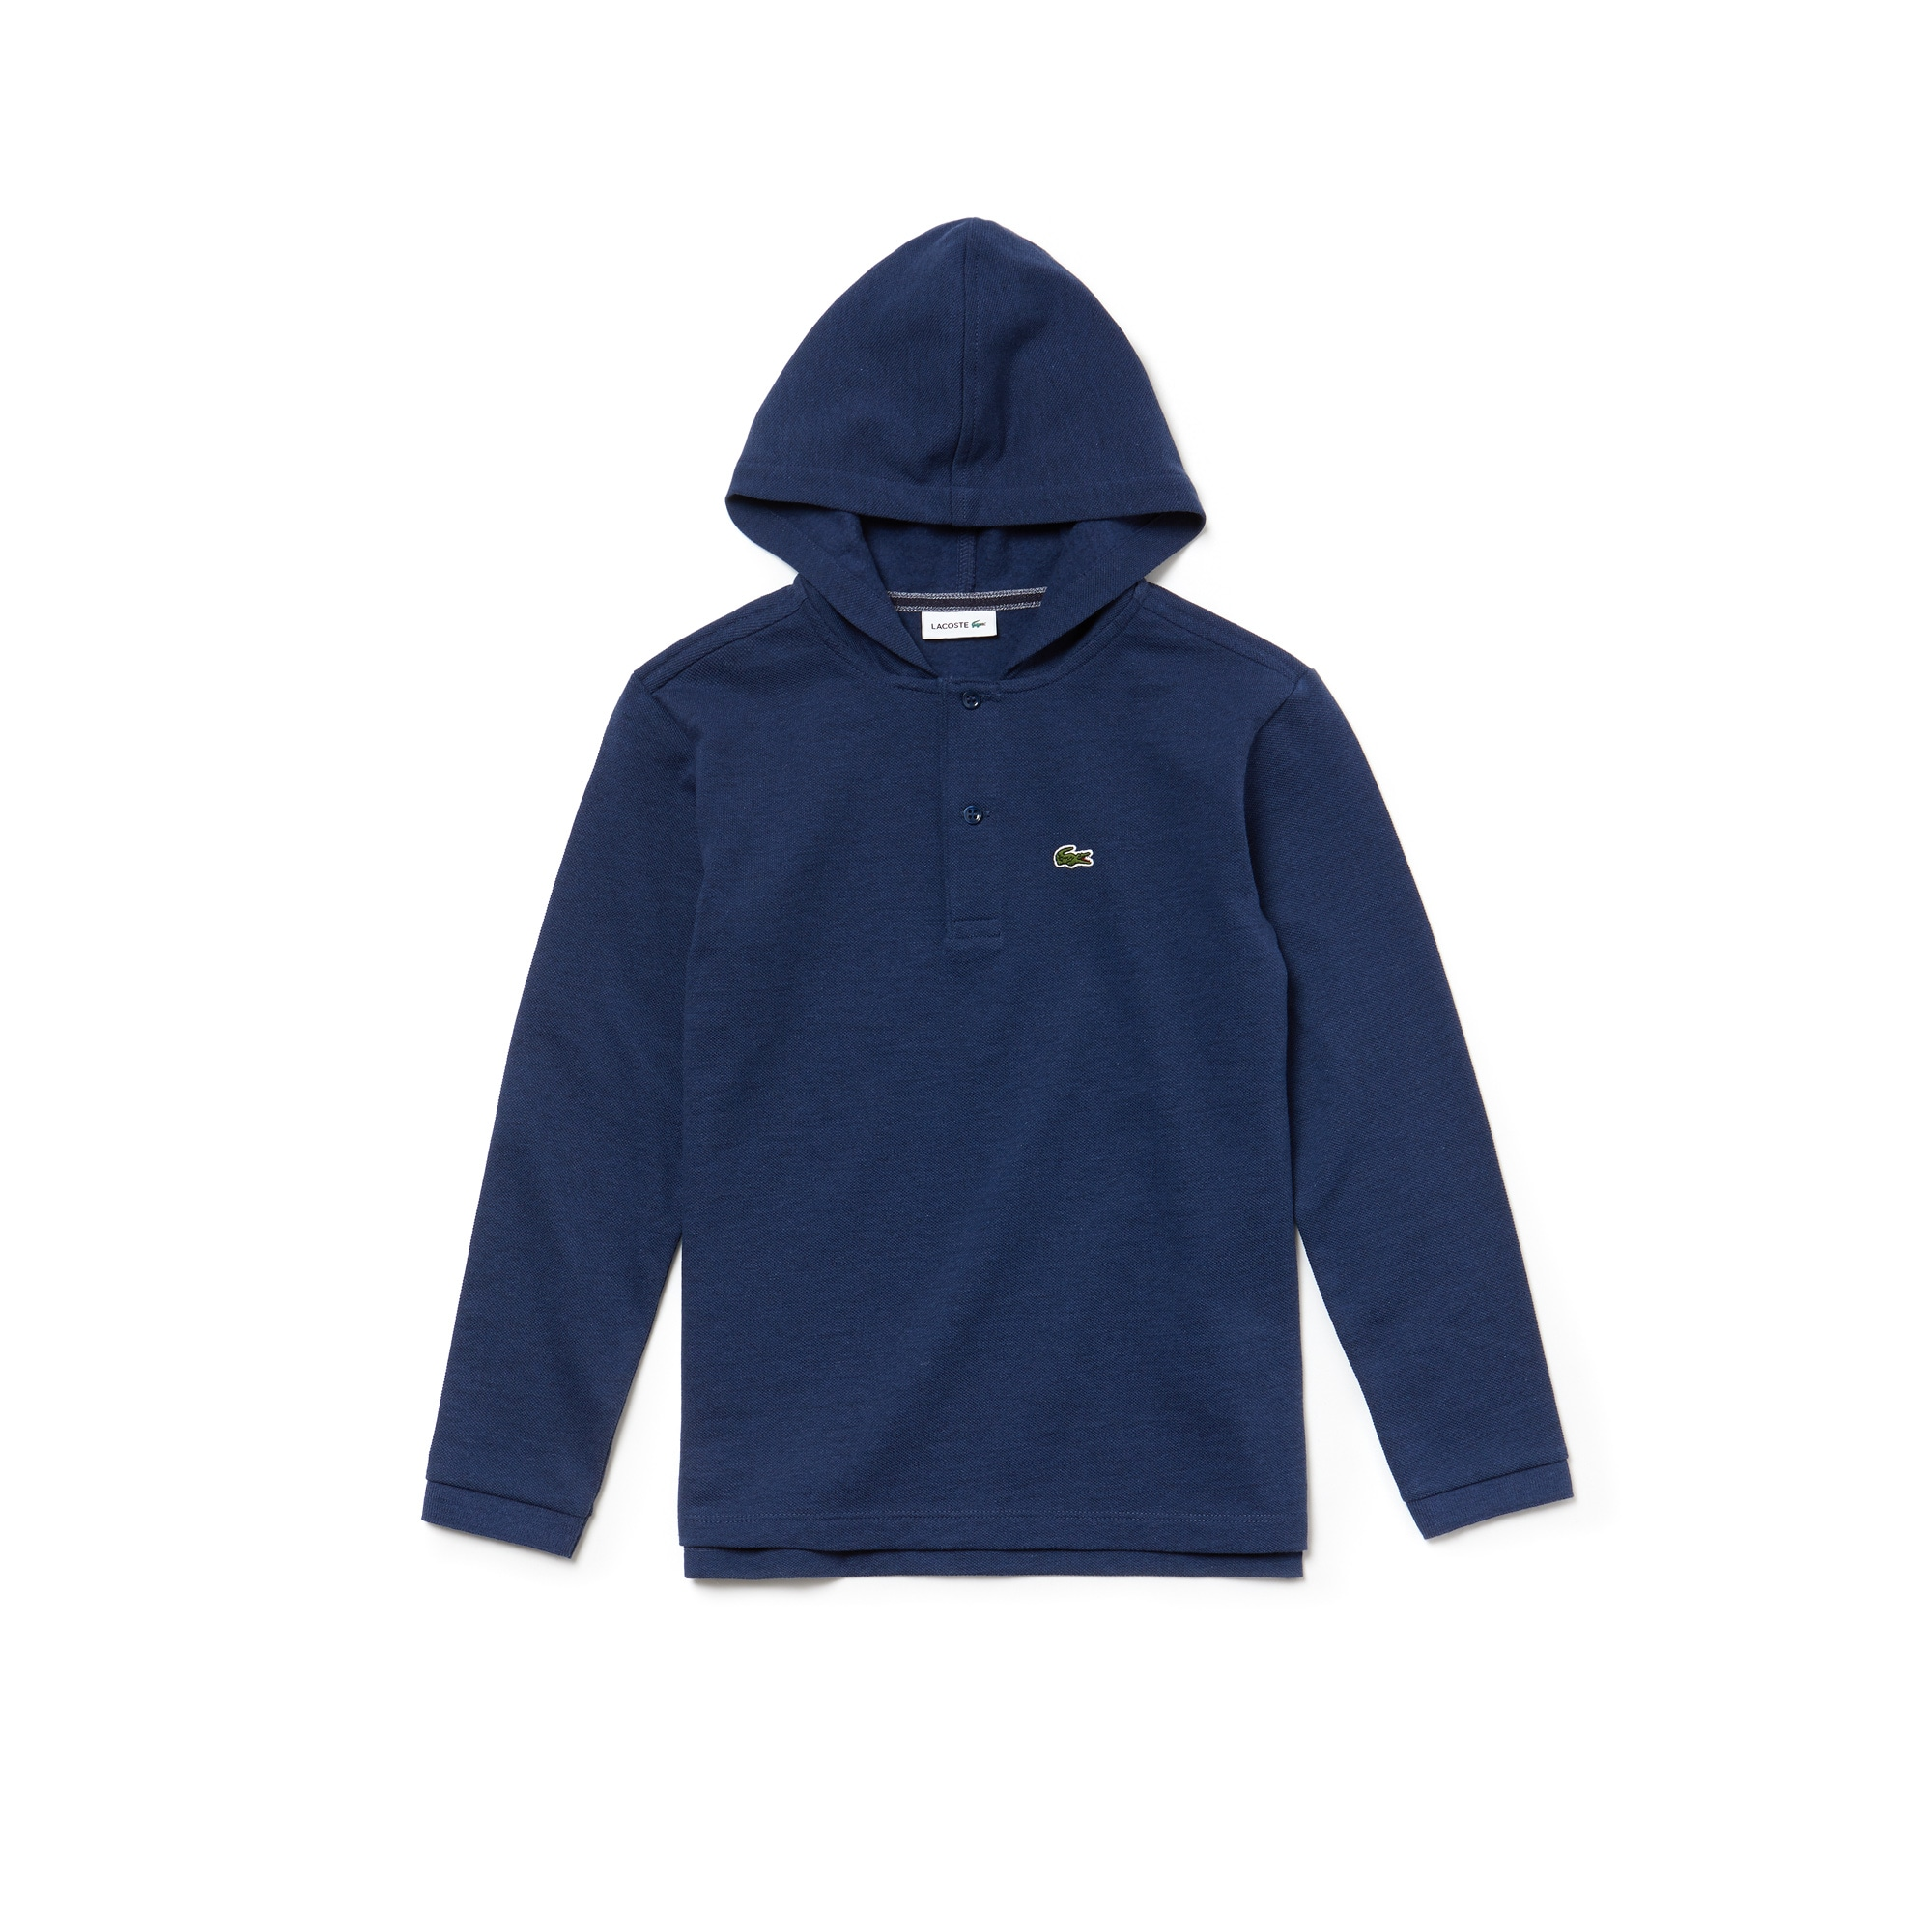 LACOSTE Jungen-Poloshirt mit Kapuze aus Piqué